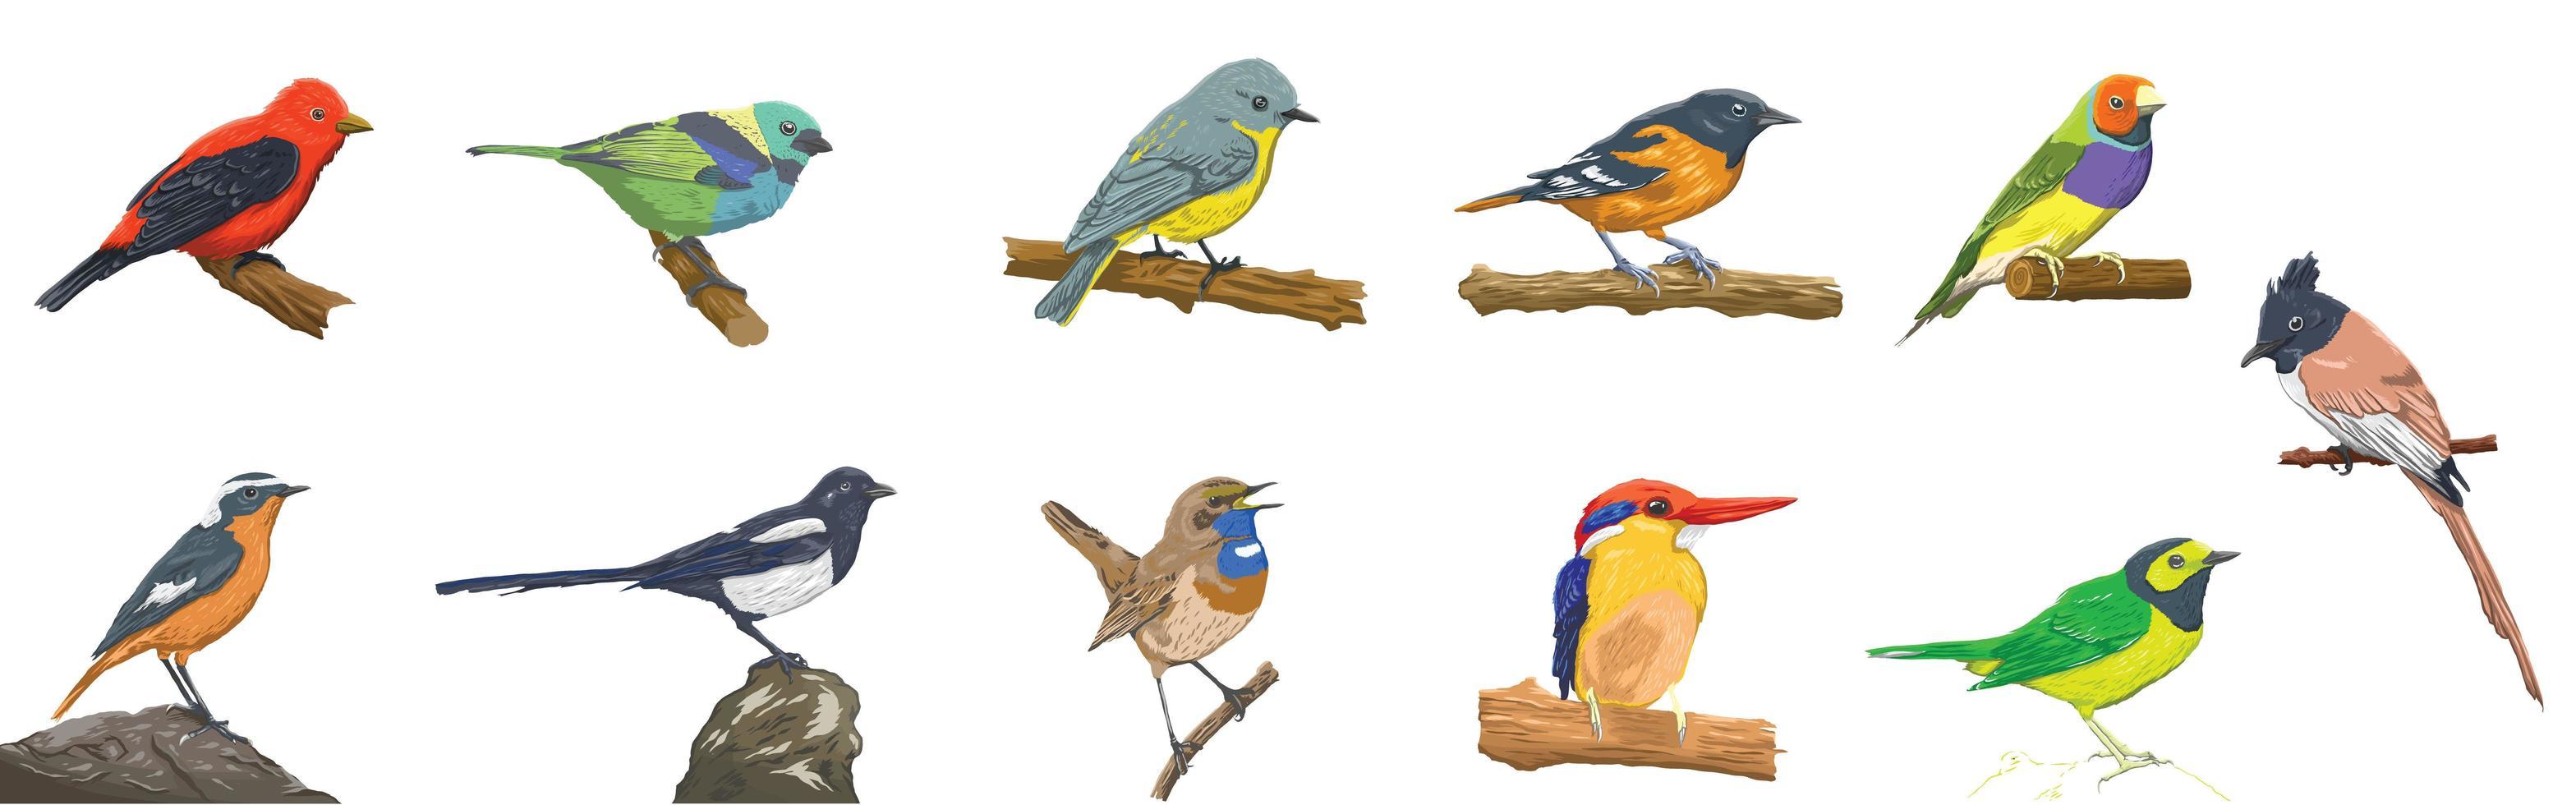 buntes realistisches Vogelset vektor